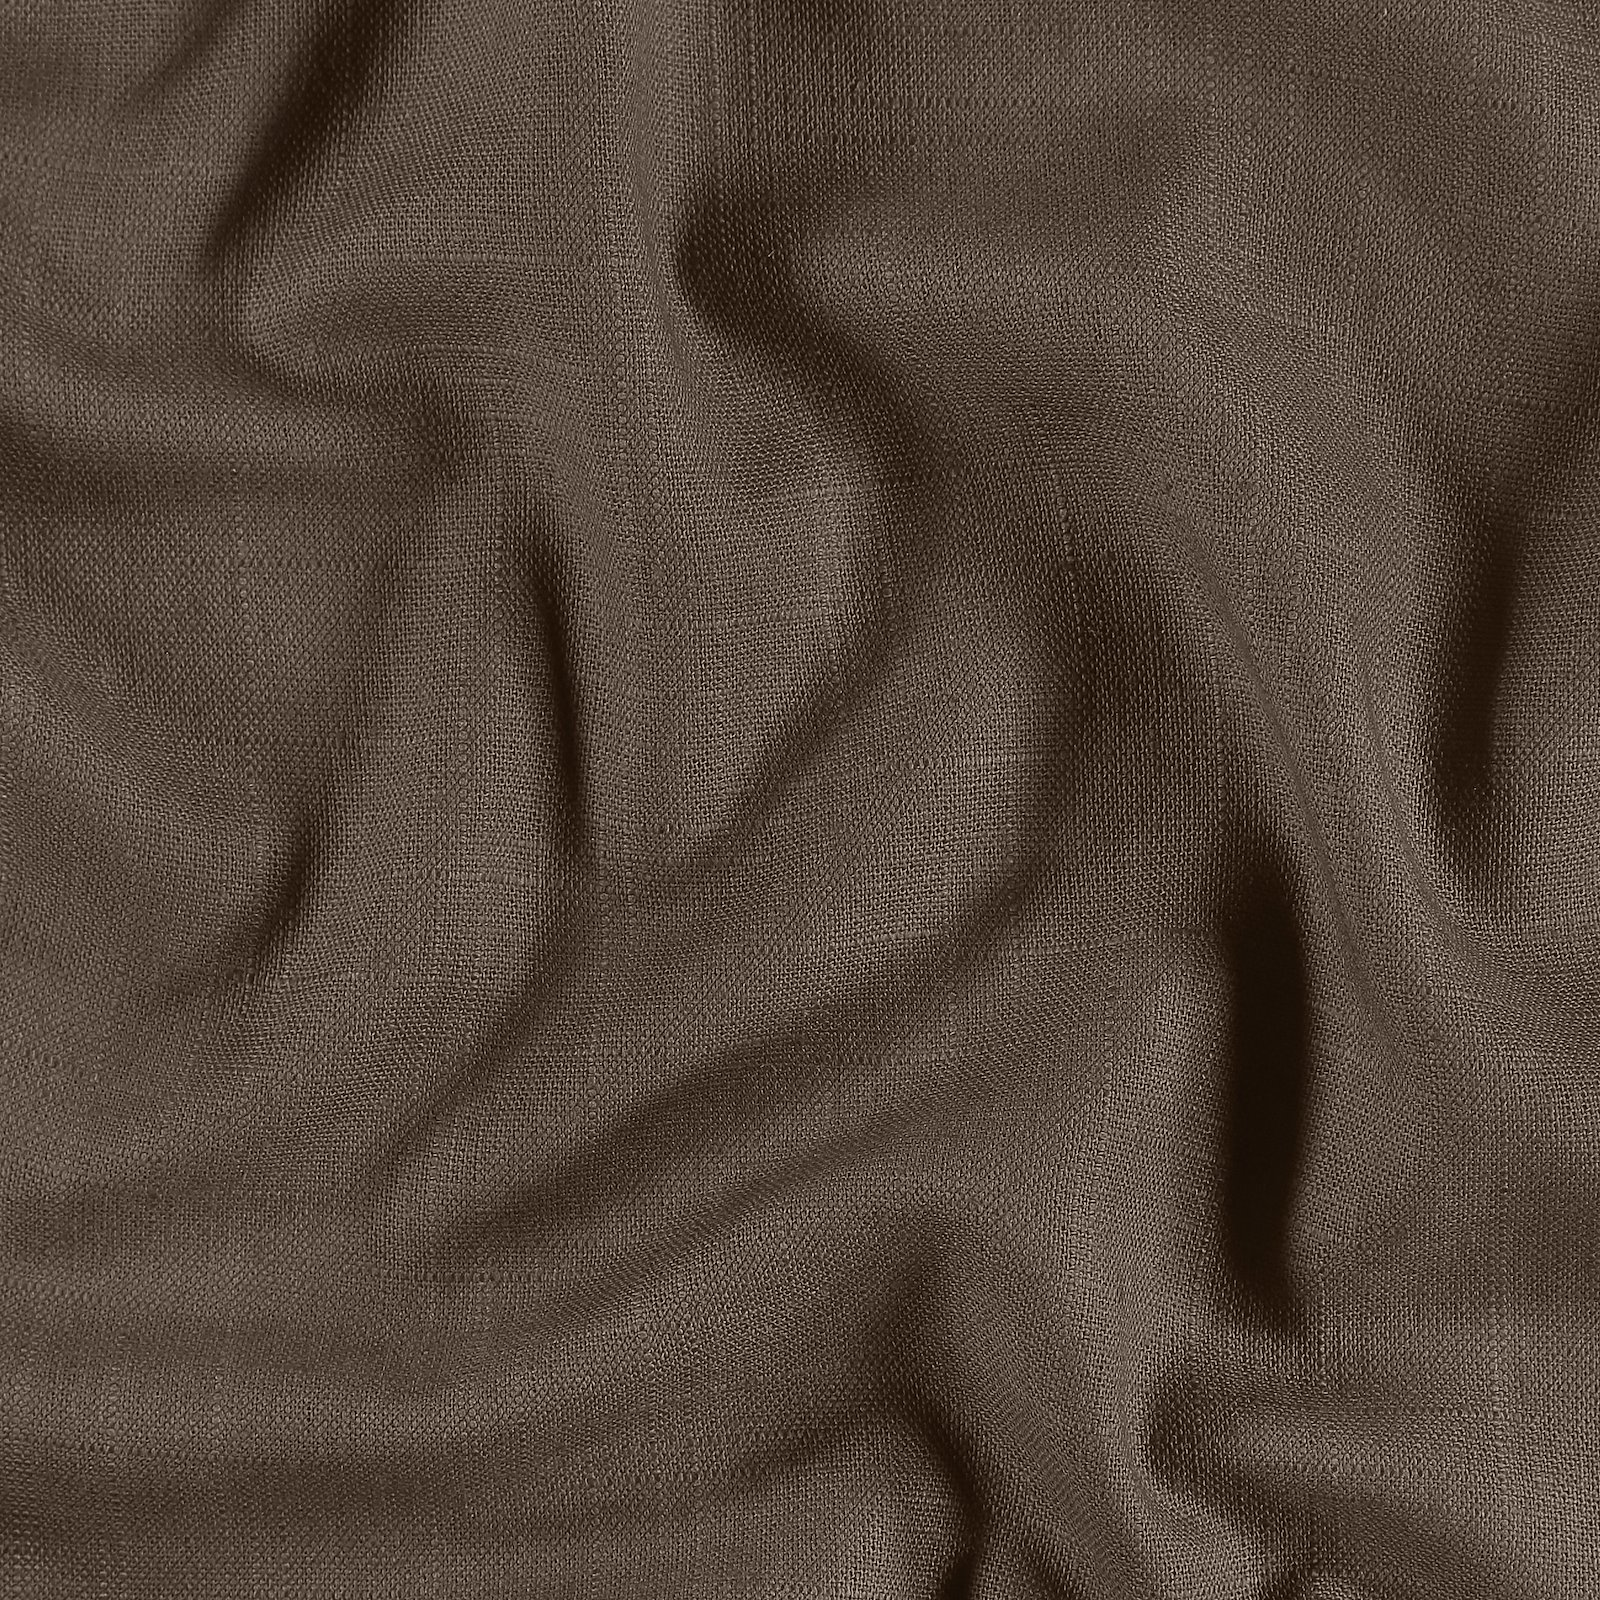 Coarse linen/viscose warm walnut 852392_pack